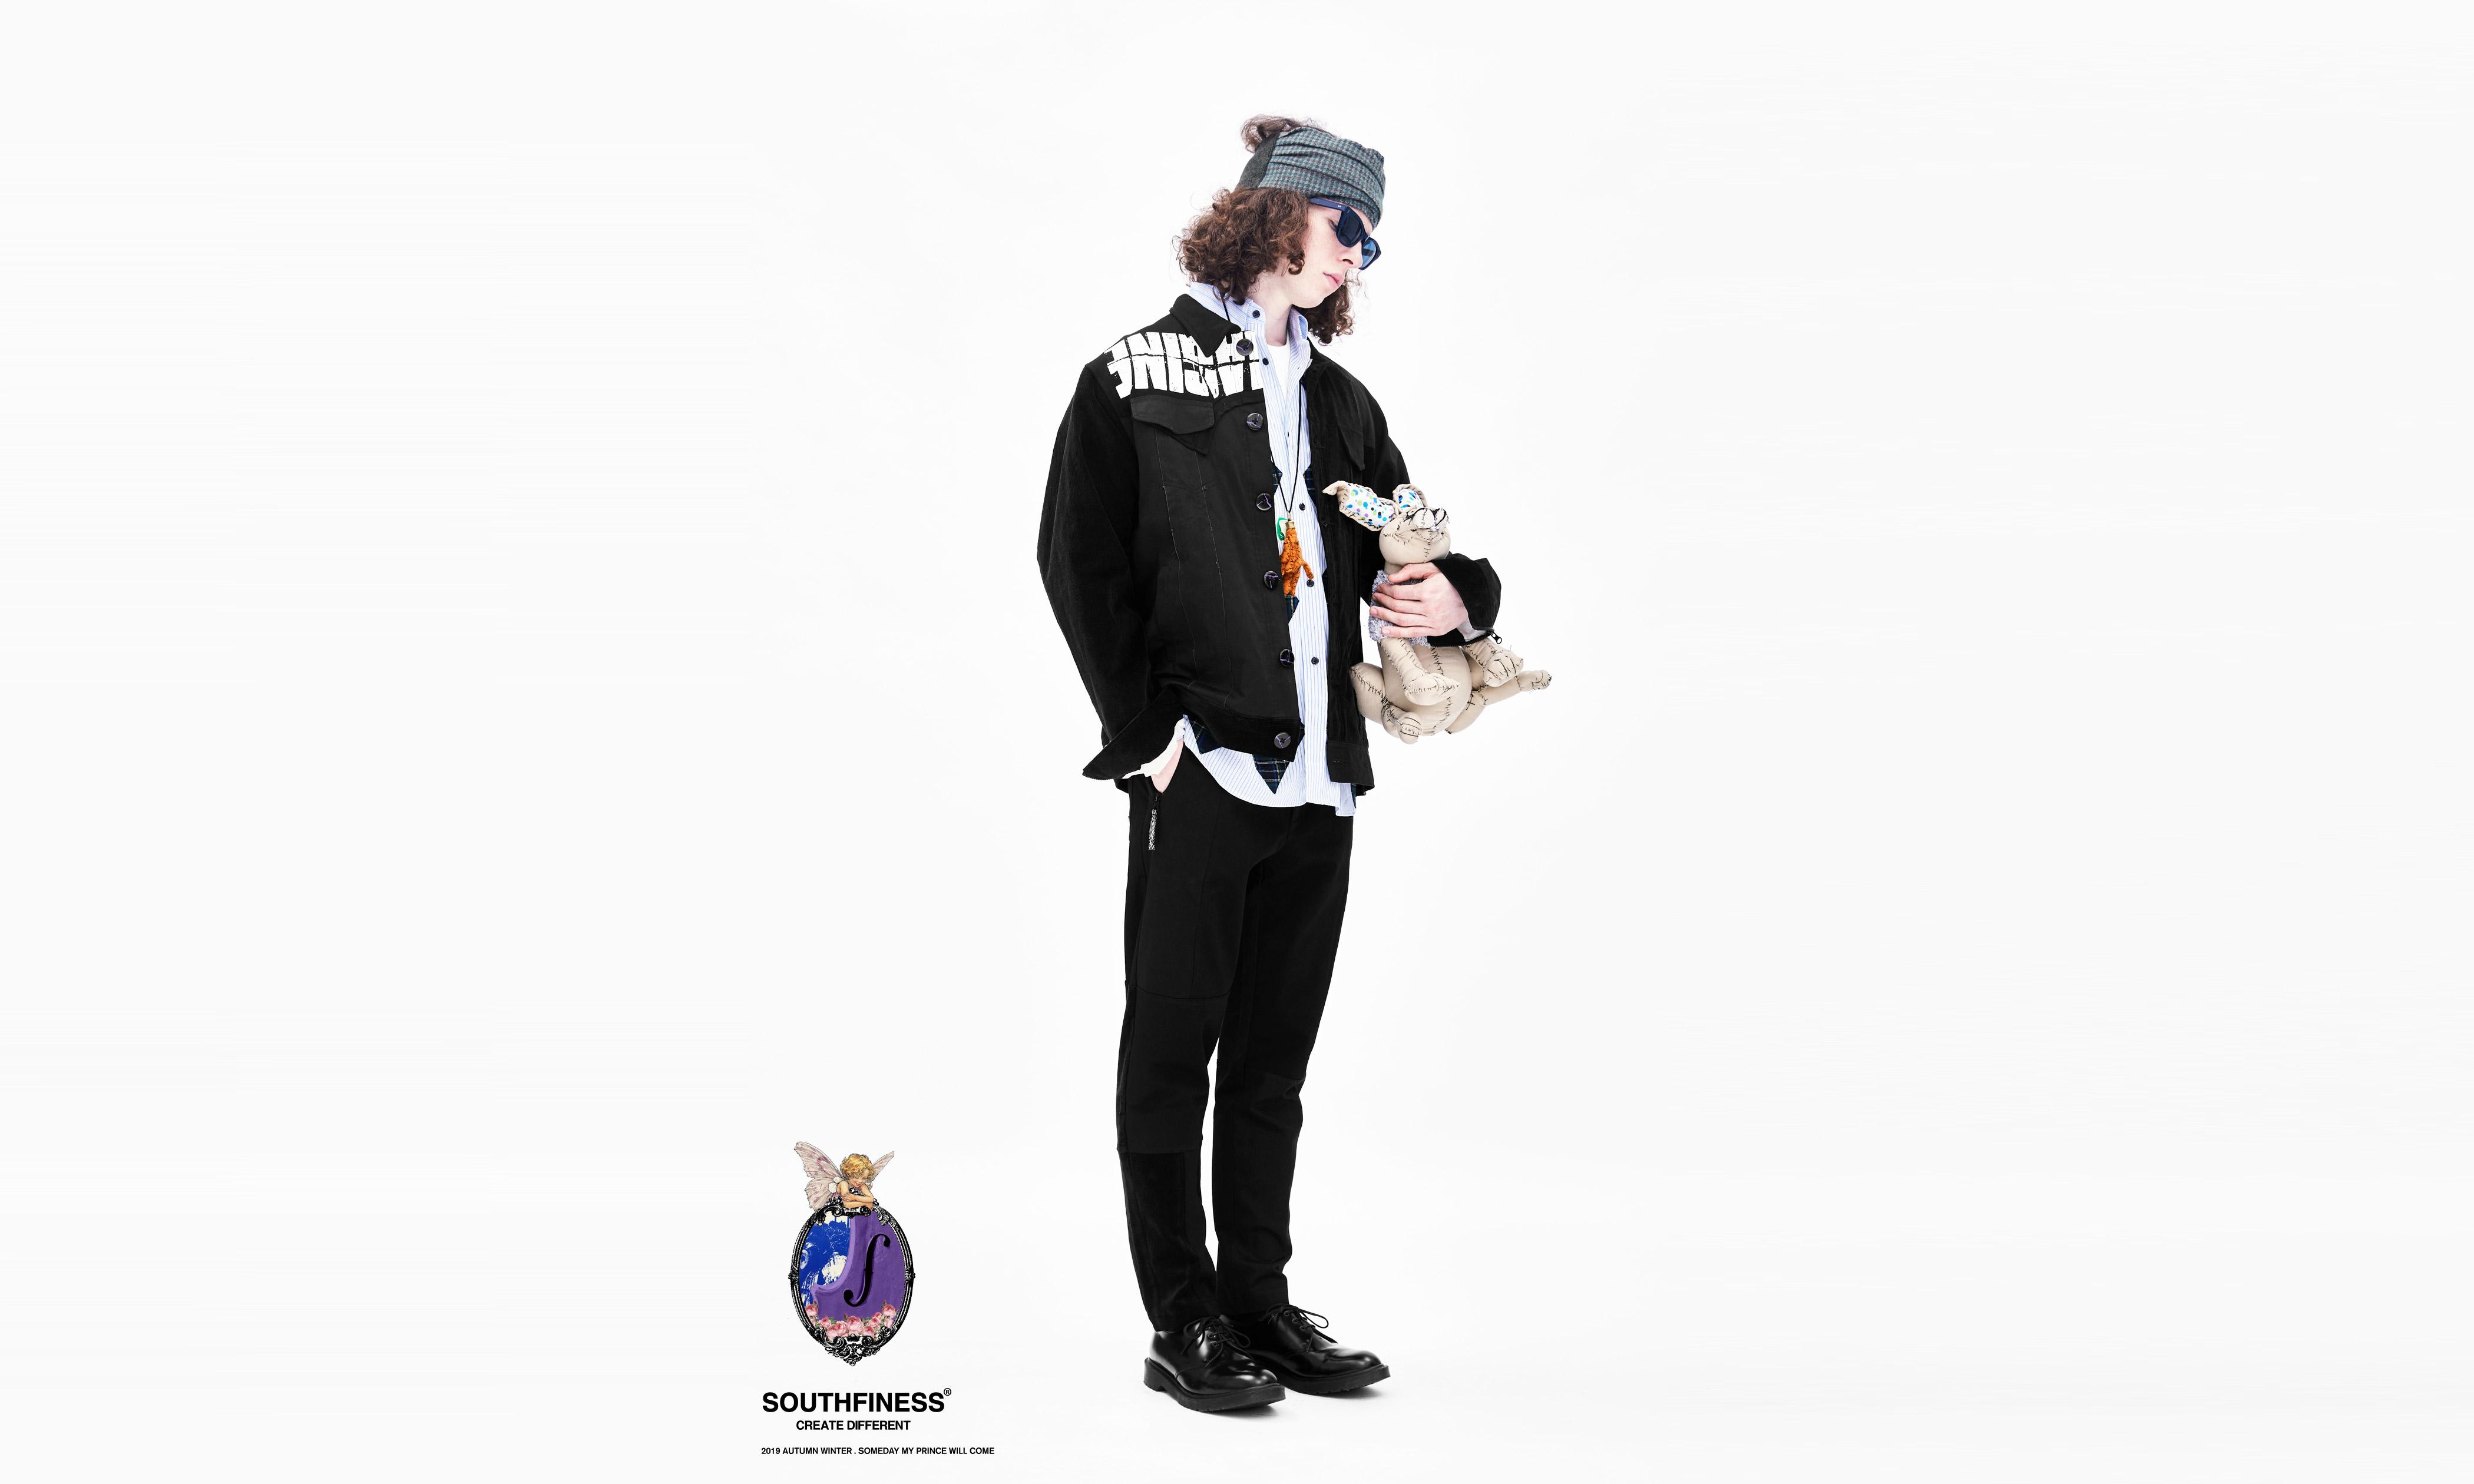 SOUTHFINESS 2019 秋冬系列造型 Lookbook 发布